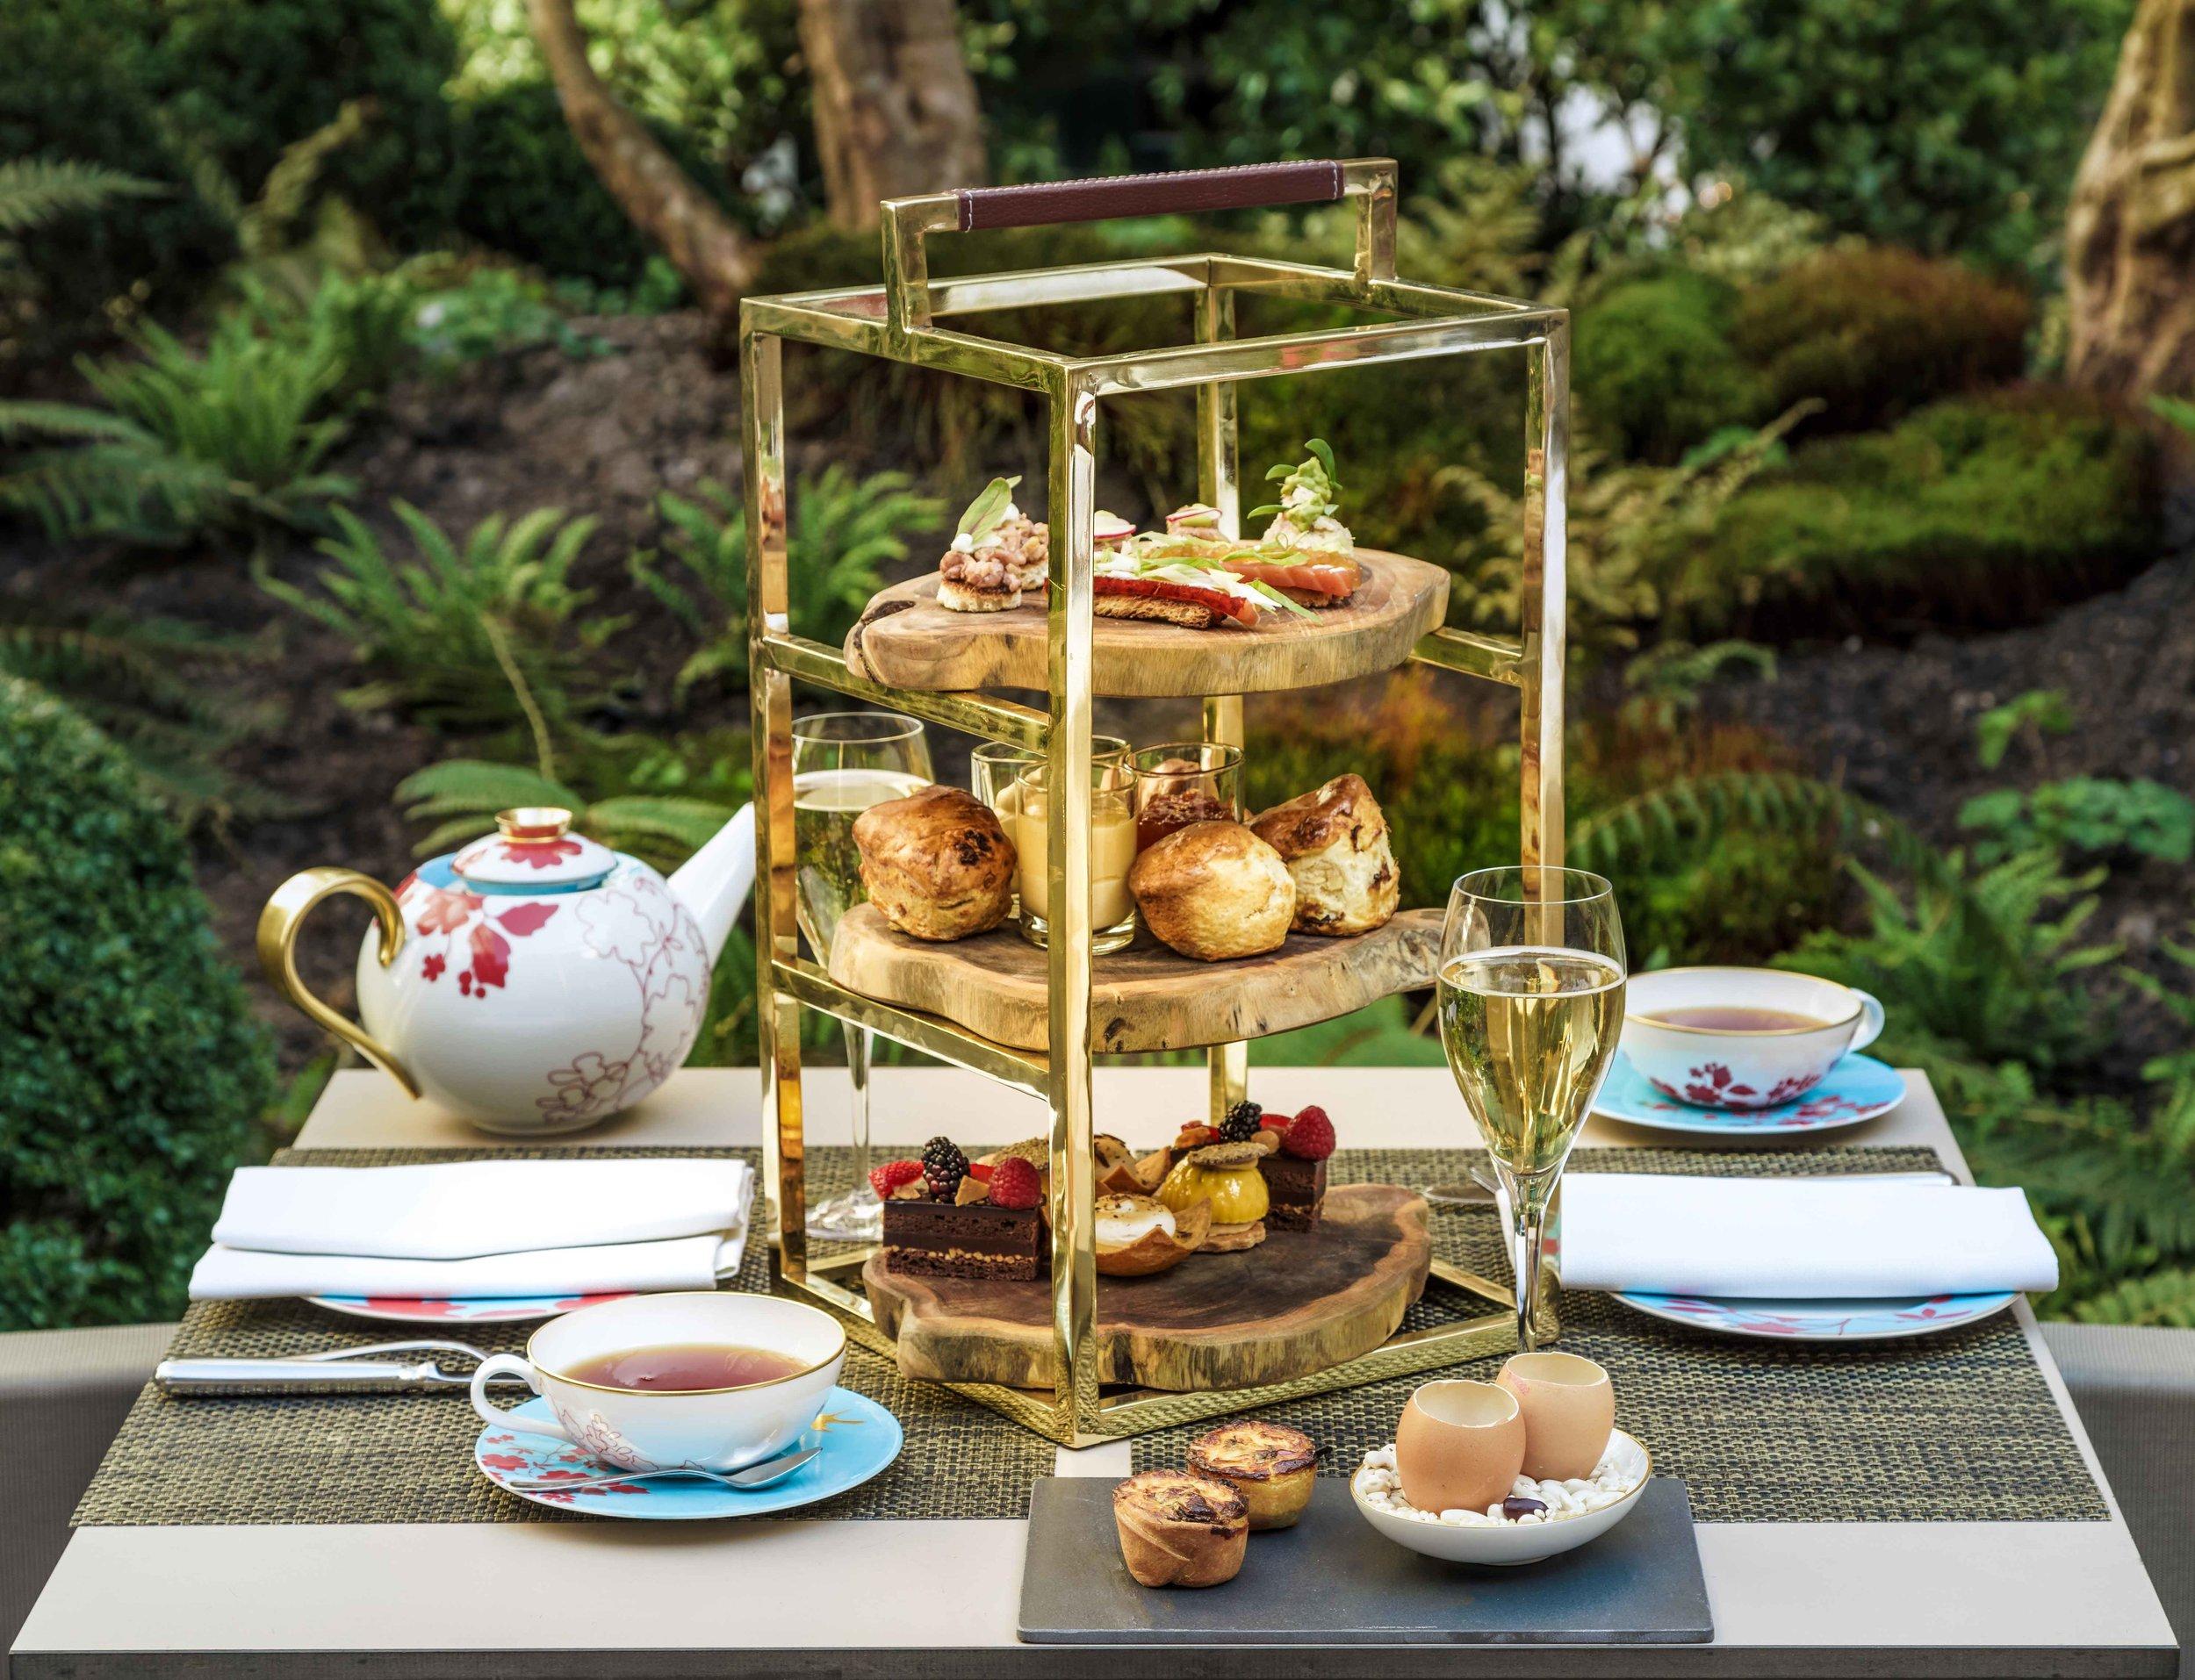 Afternoon Tea at garden terrace, Sofitel Legend Amsterdam The Grand. Photo: Sofitel Amsterdam